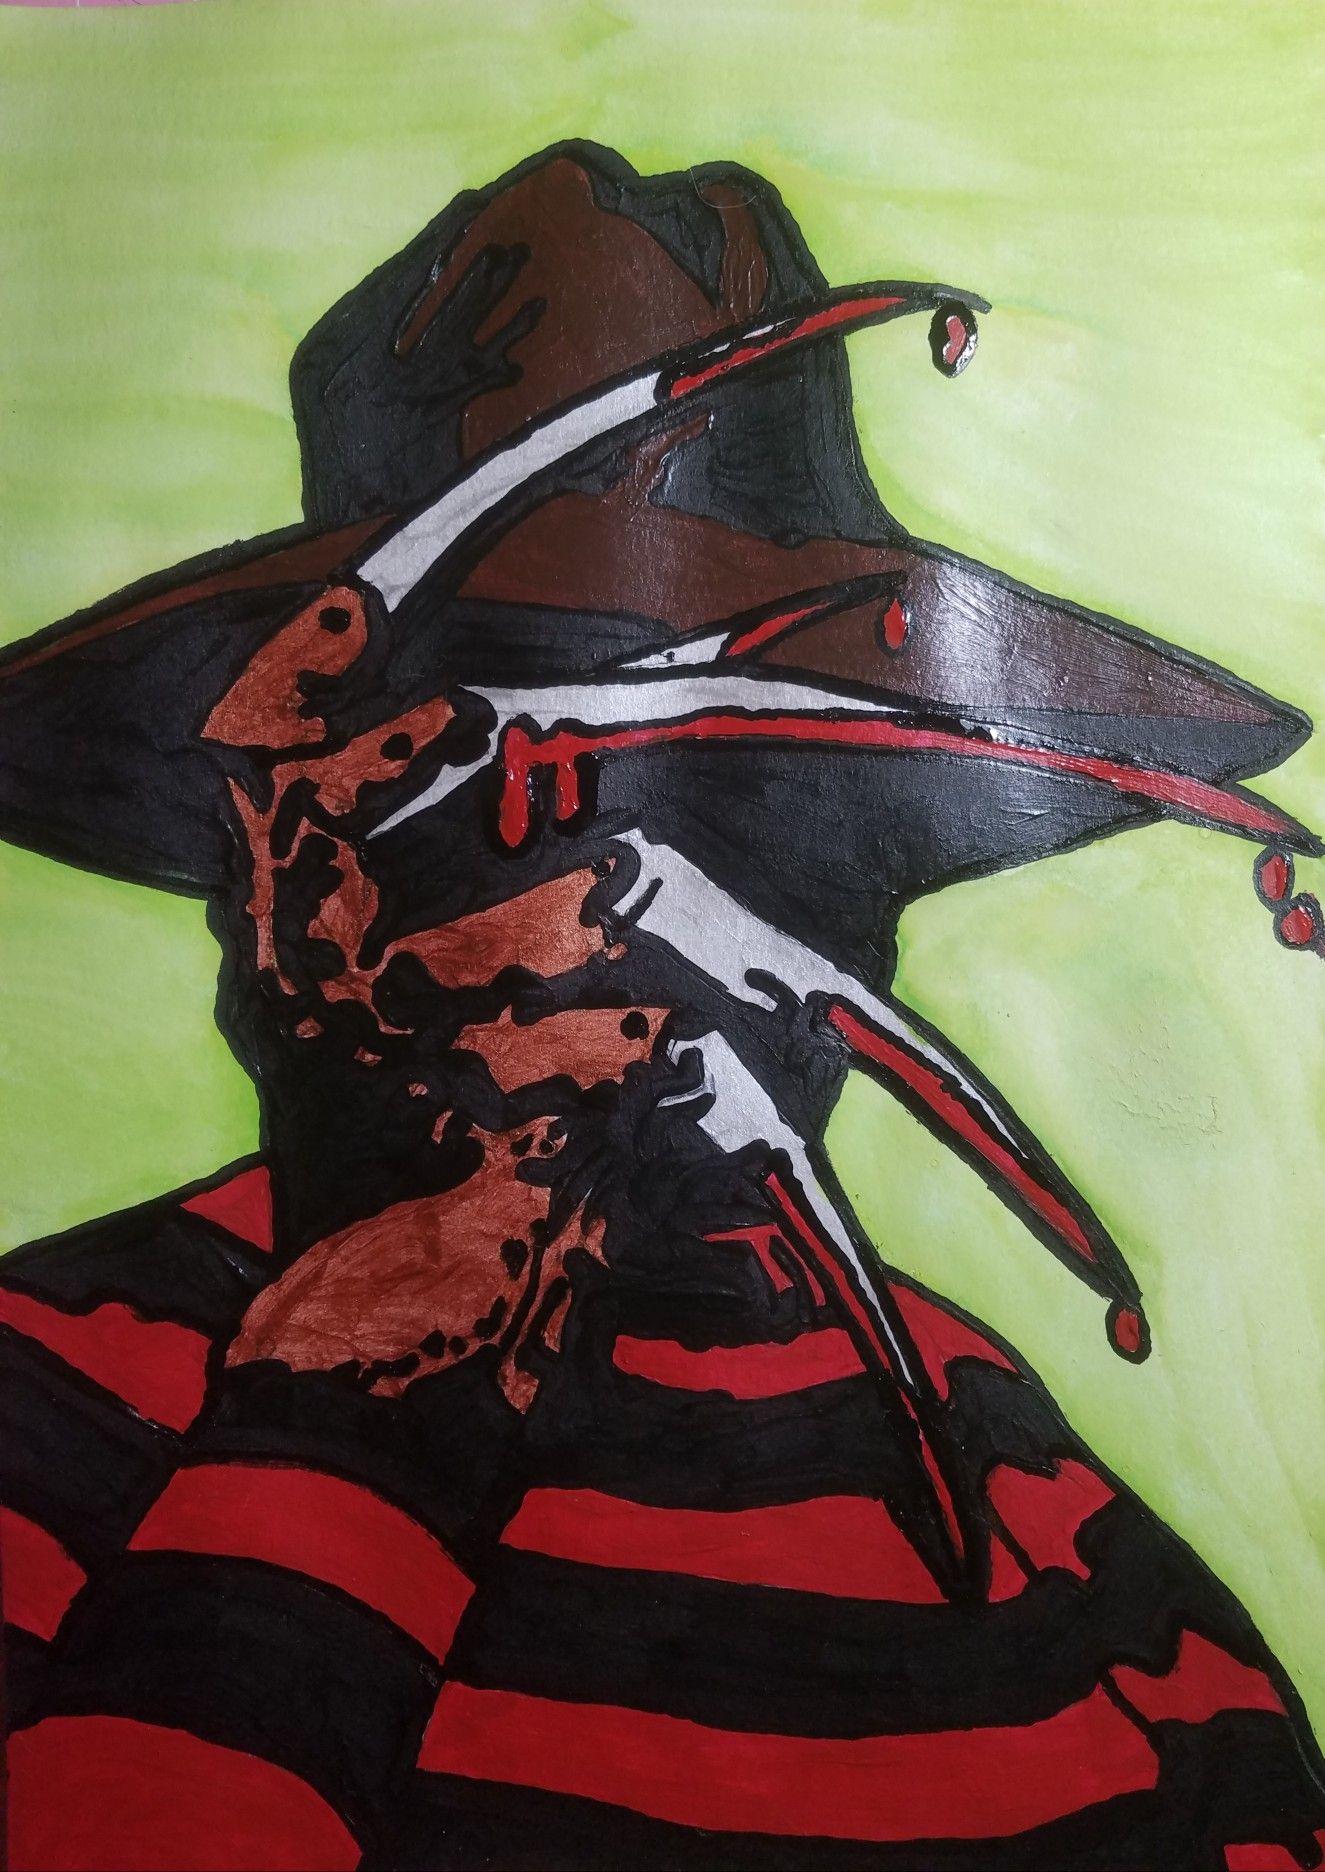 Freddy Krueger Halloween Canvas Art Scary Paintings Freddy Krueger Art